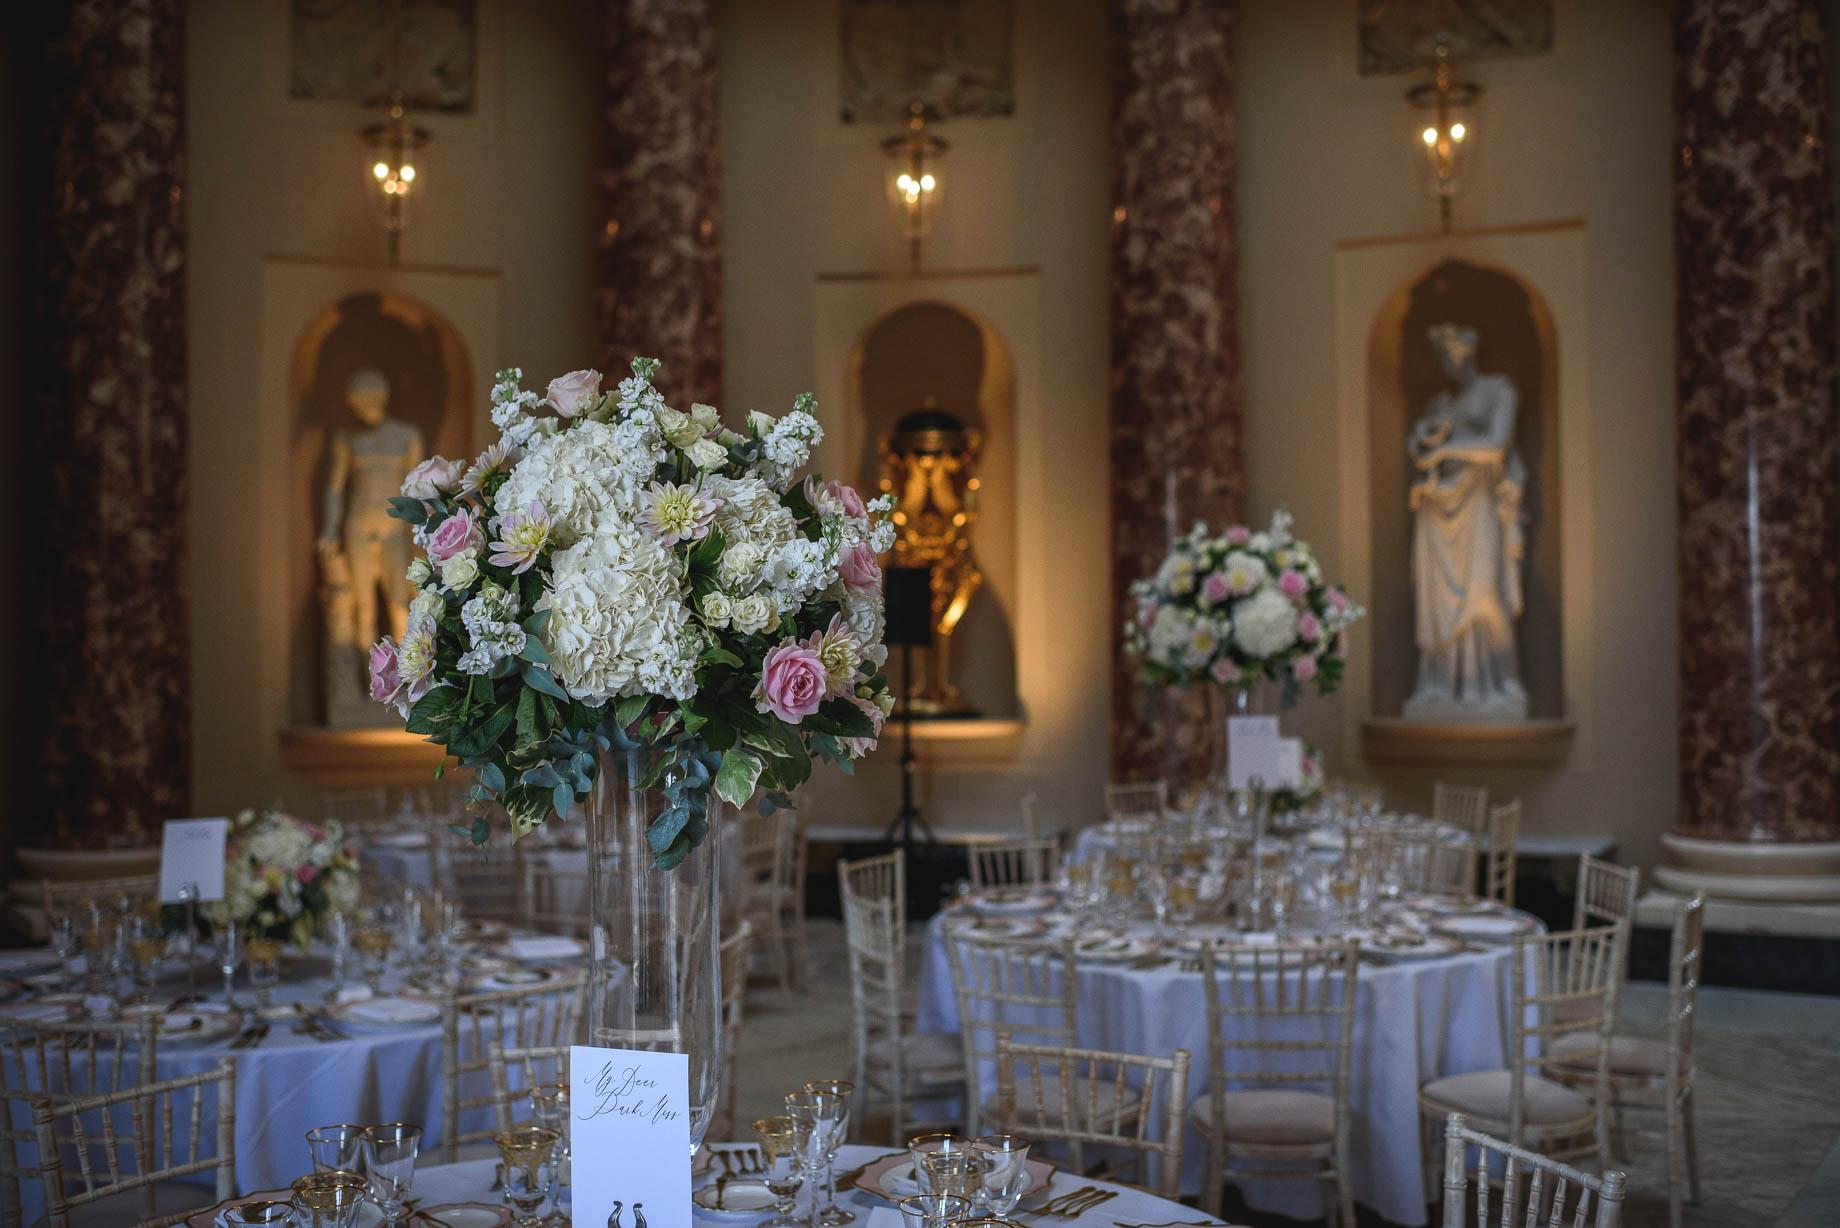 Stowe House Wedding Venue